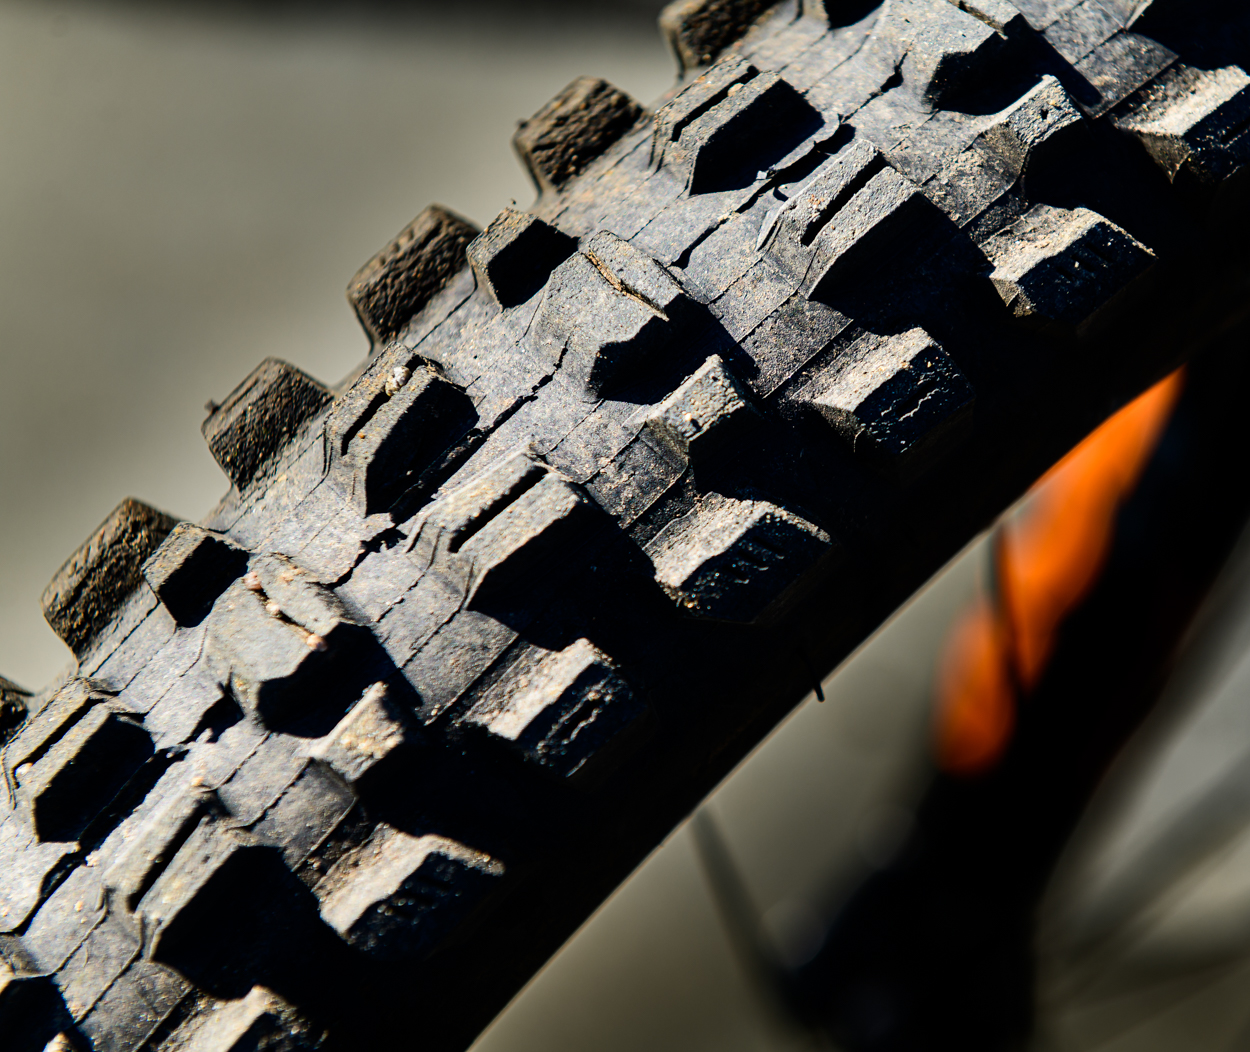 Reviewing the Maxxis Assegai tire